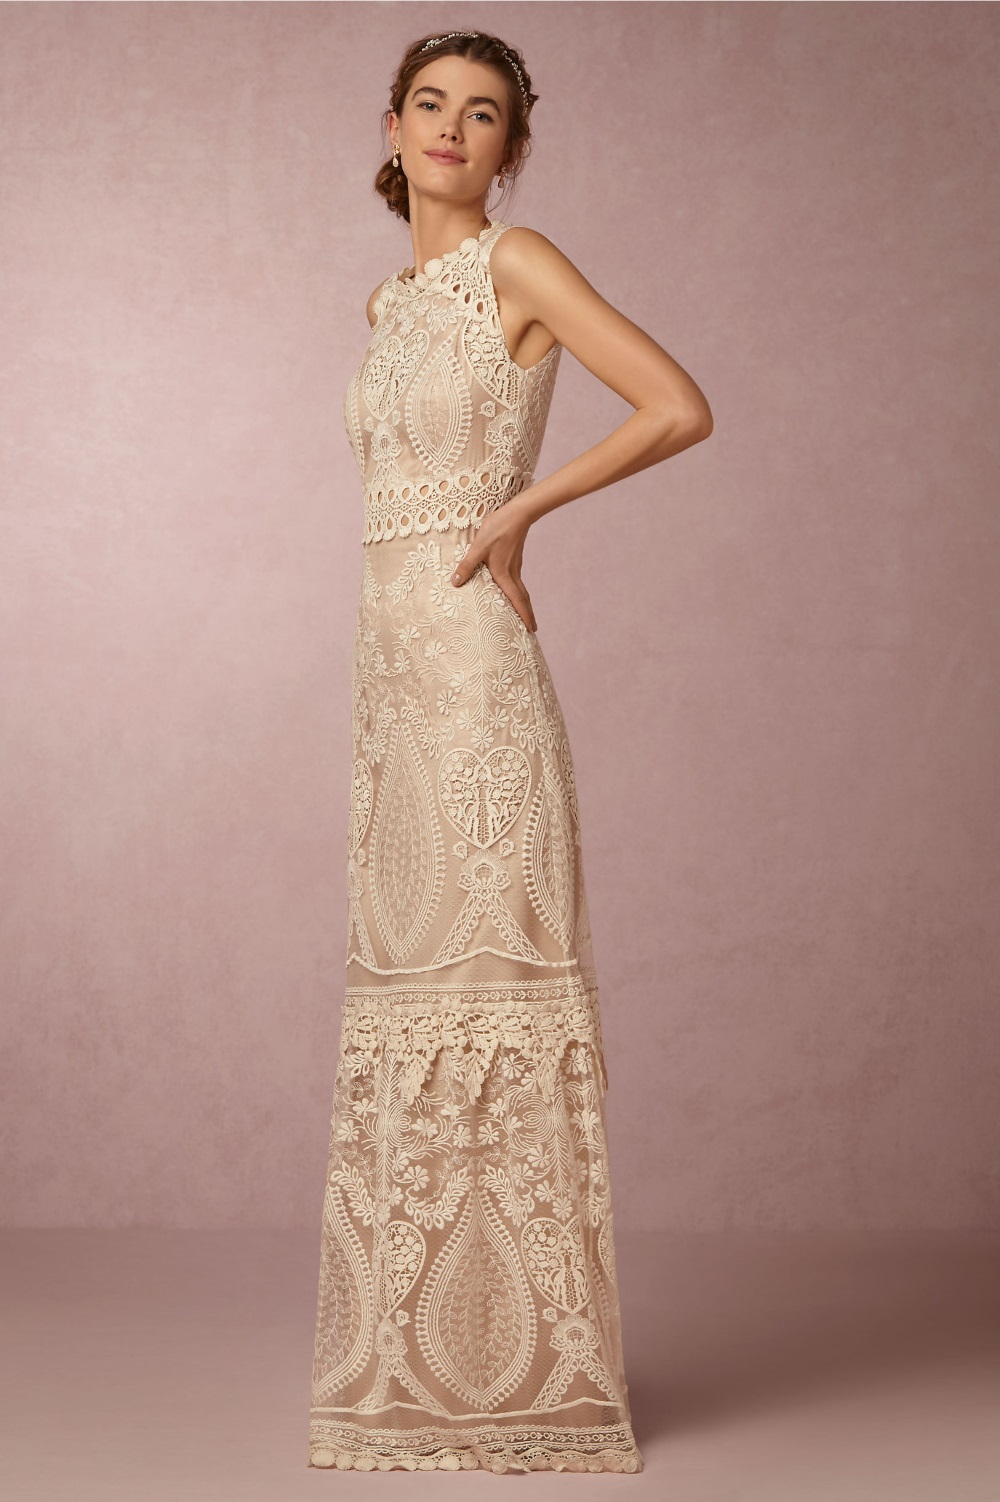 Roane\' Embroidered Bridal Gown - Chic Vintage Brides : Chic Vintage ...